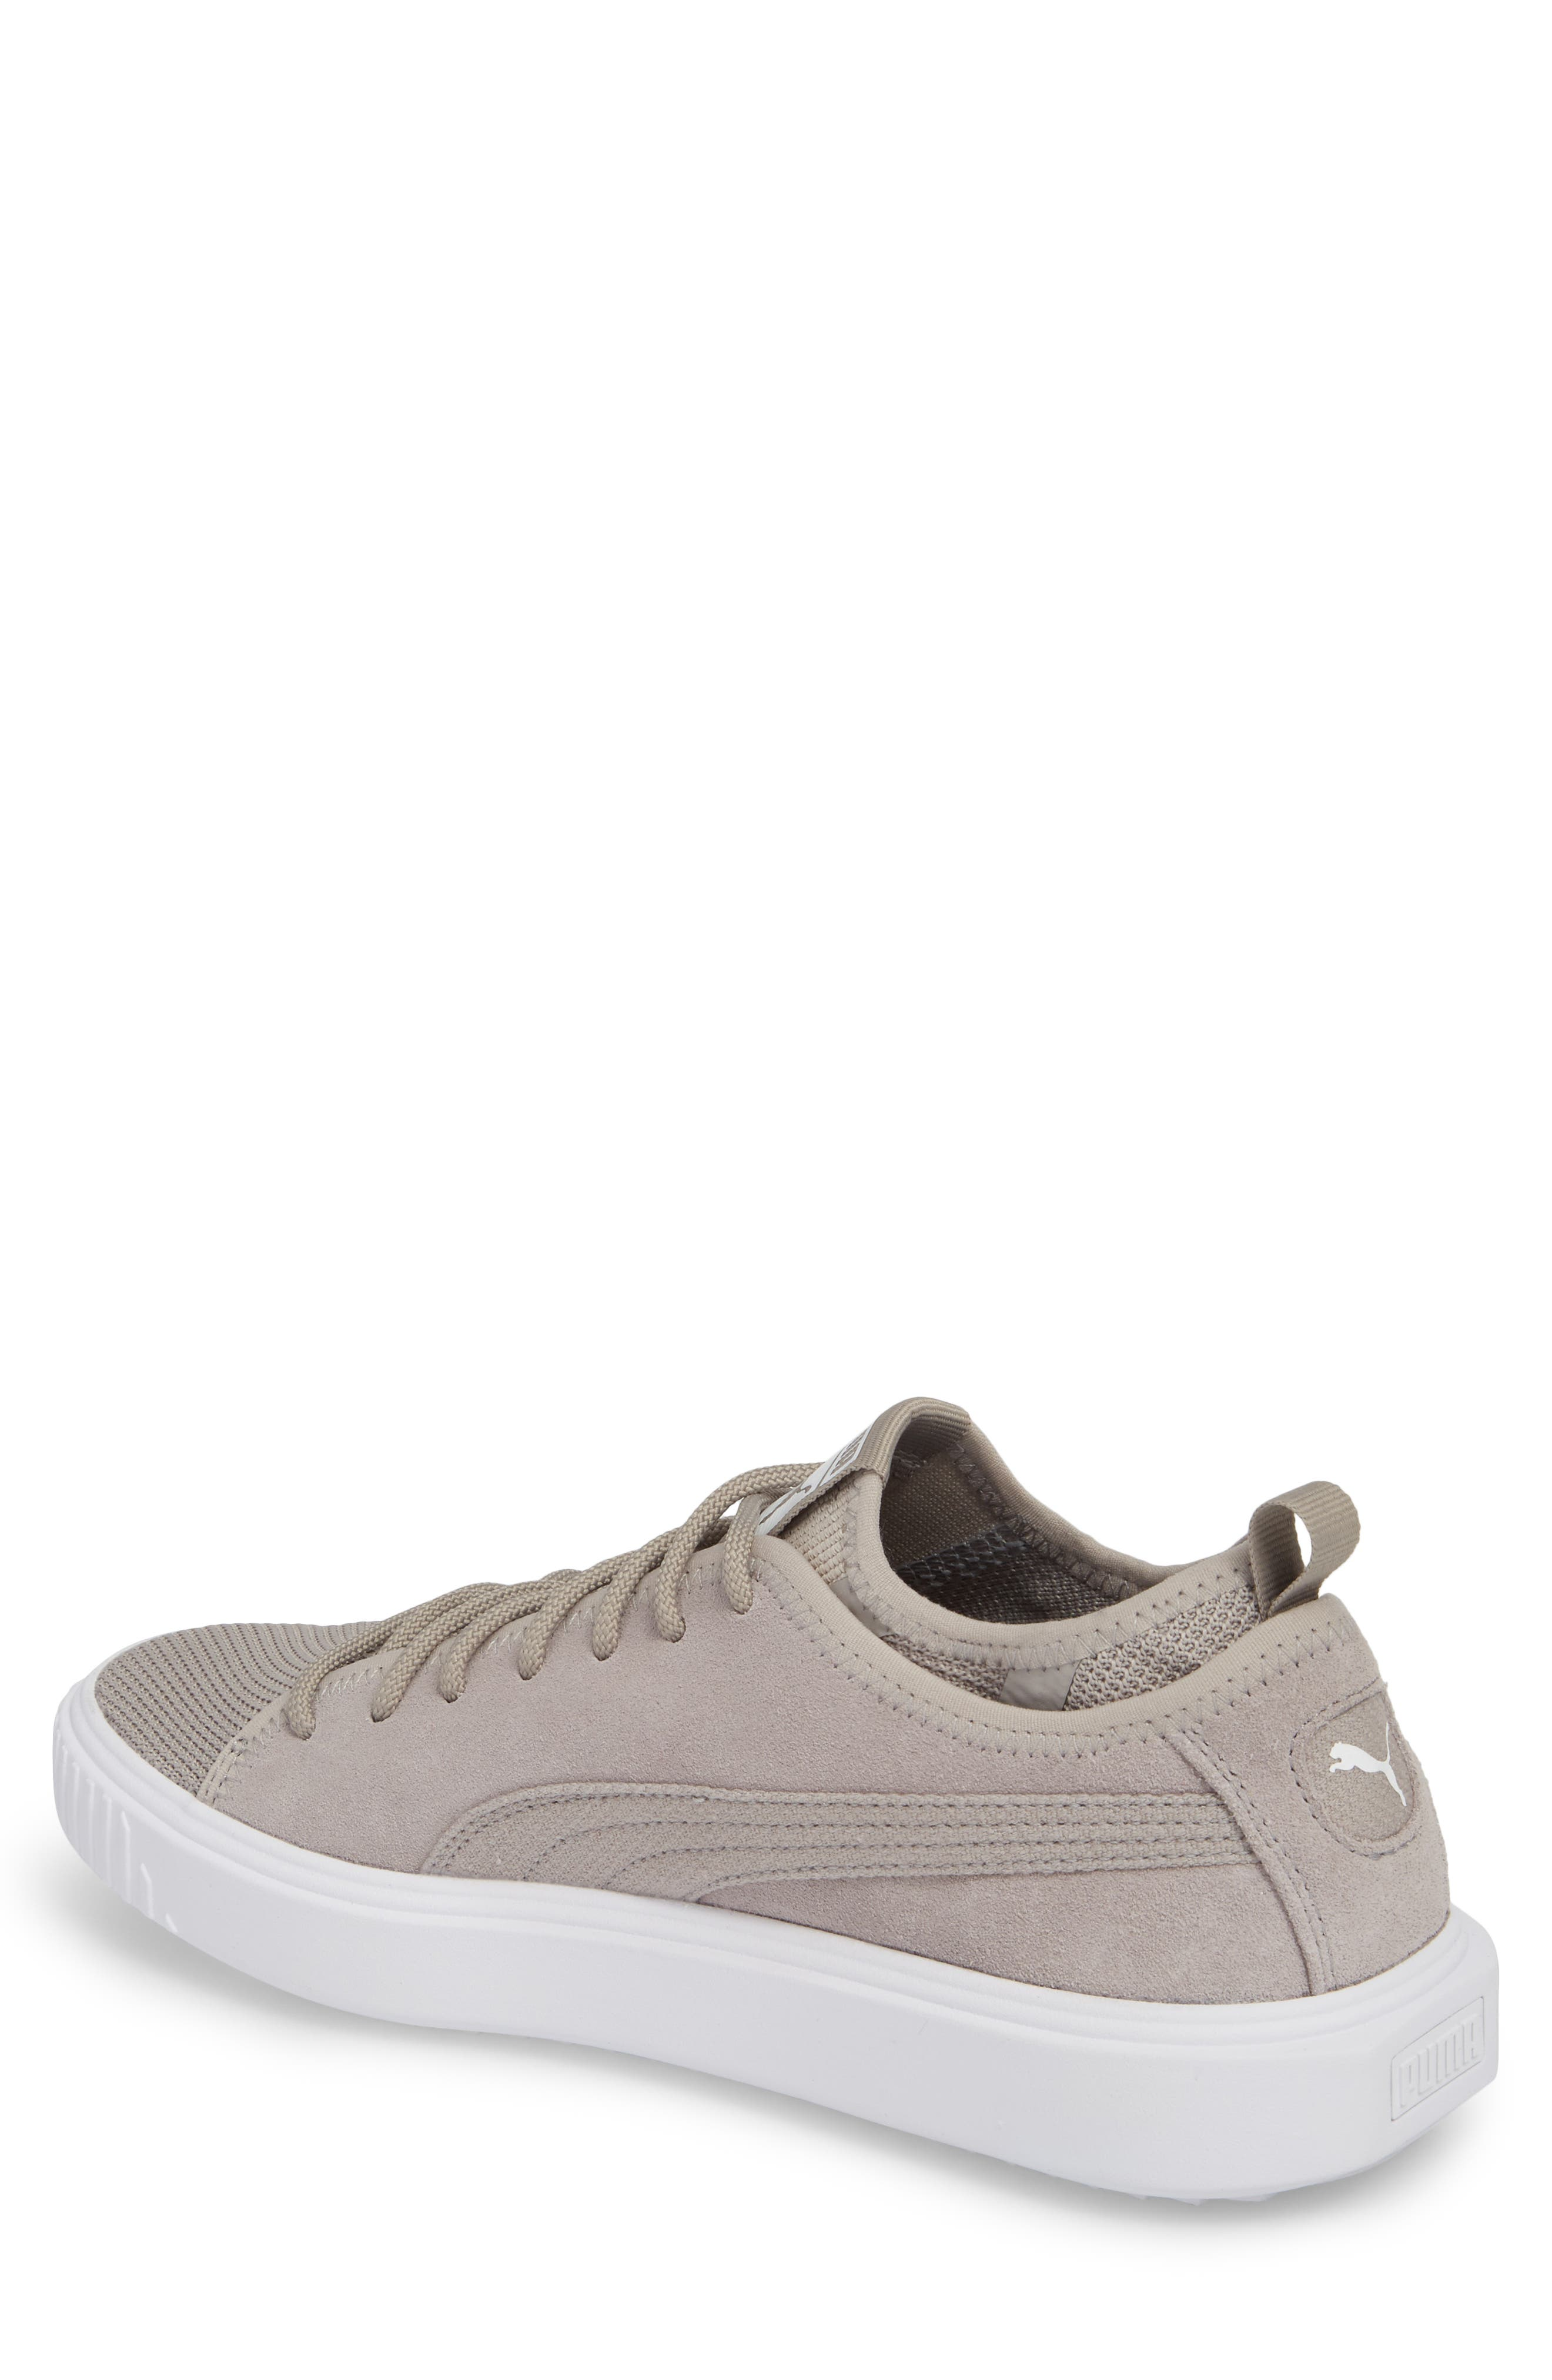 Breaker Mesh Sneaker,                             Alternate thumbnail 2, color,                             Ash/ White Suede